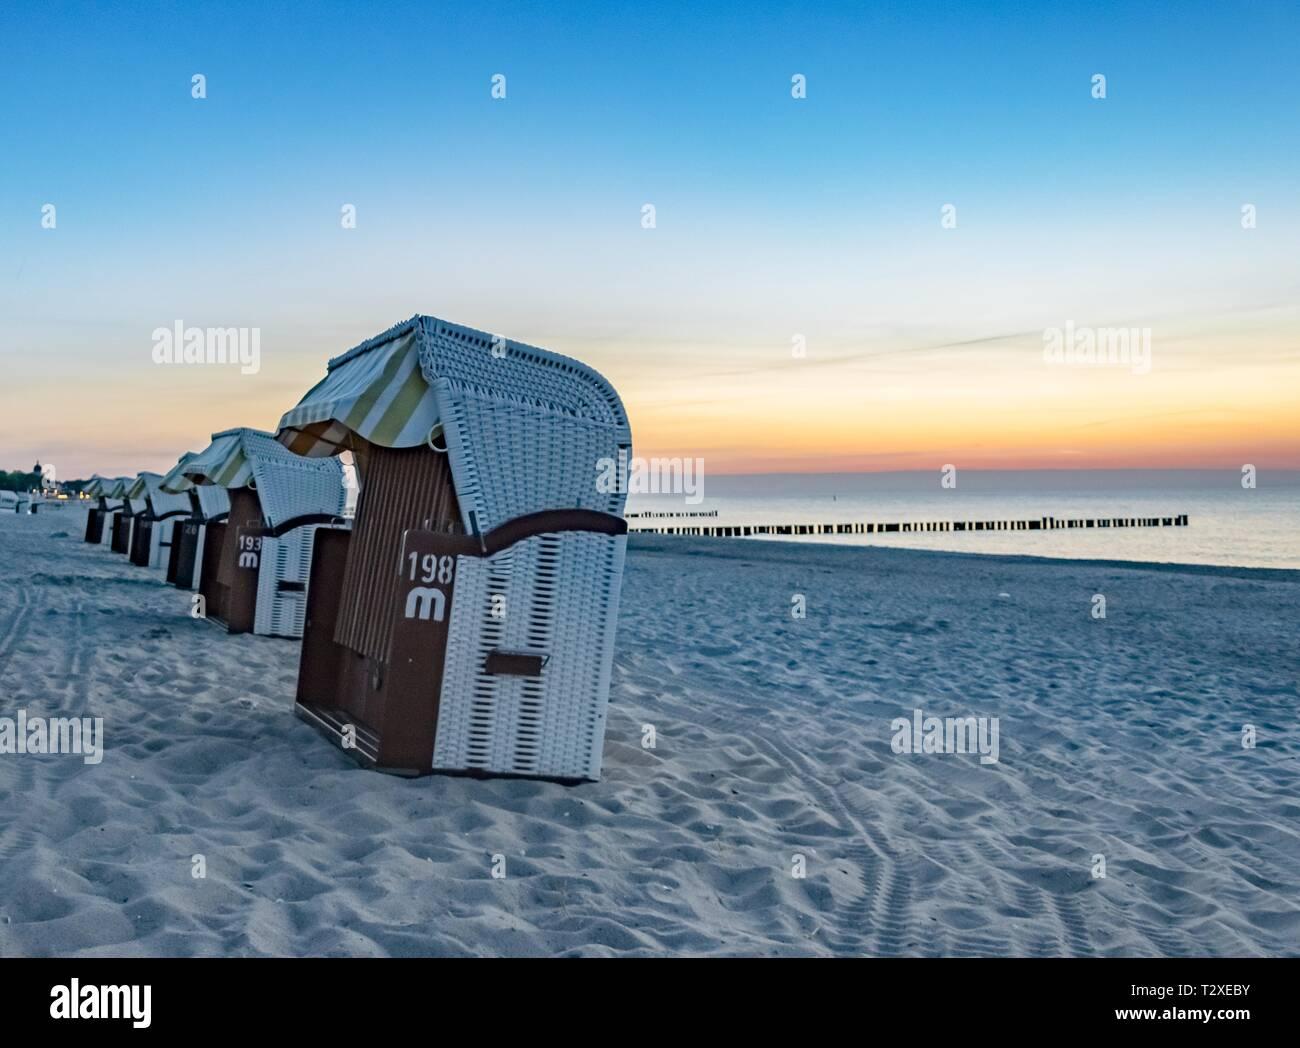 strandkörbe - Stock Image